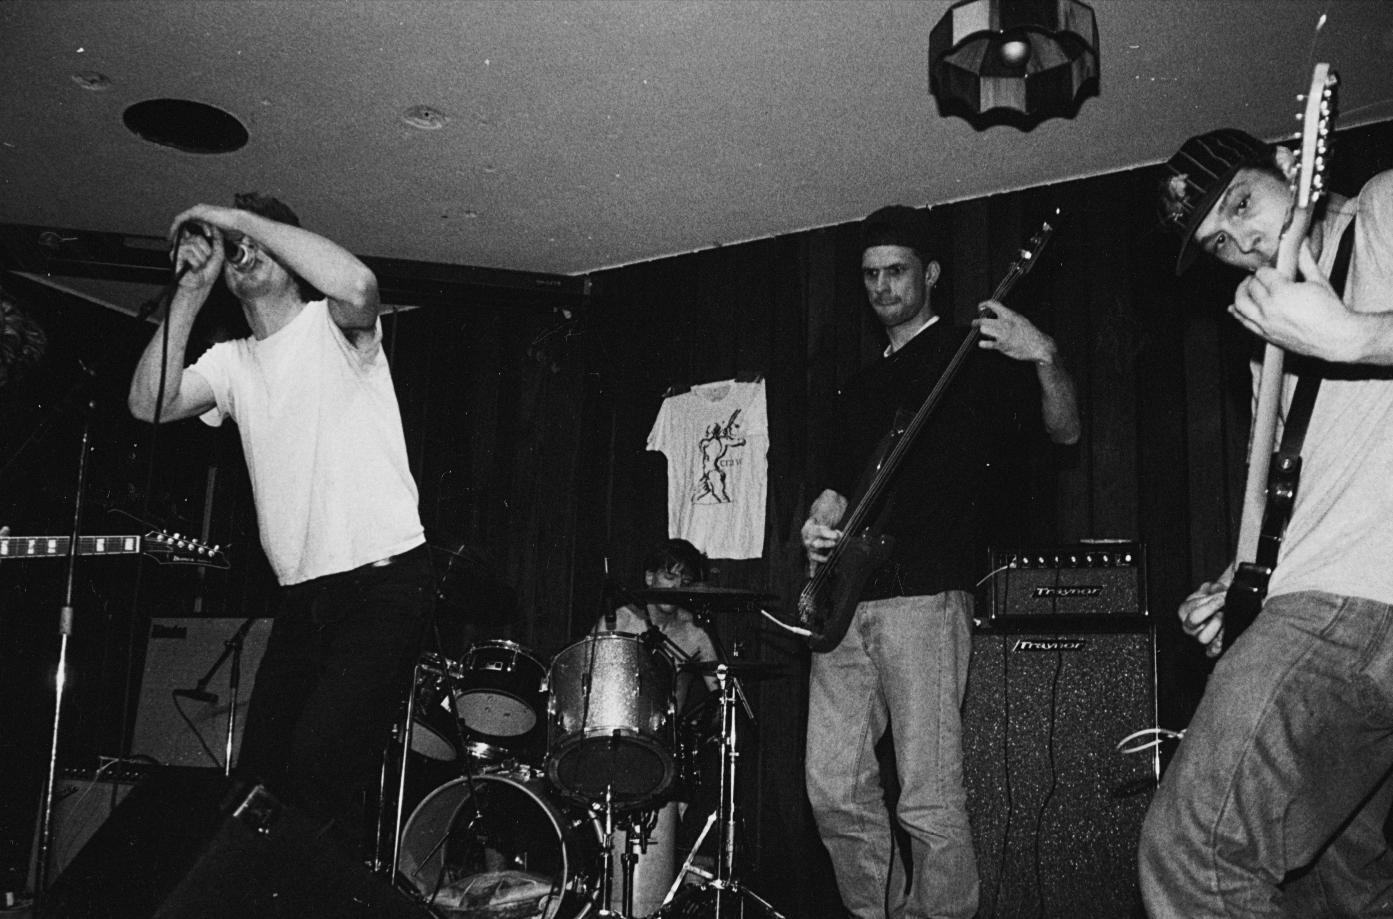 Joe McTighe, Neil Chastain, Chris Apanius, Rockie Brockway (from left)